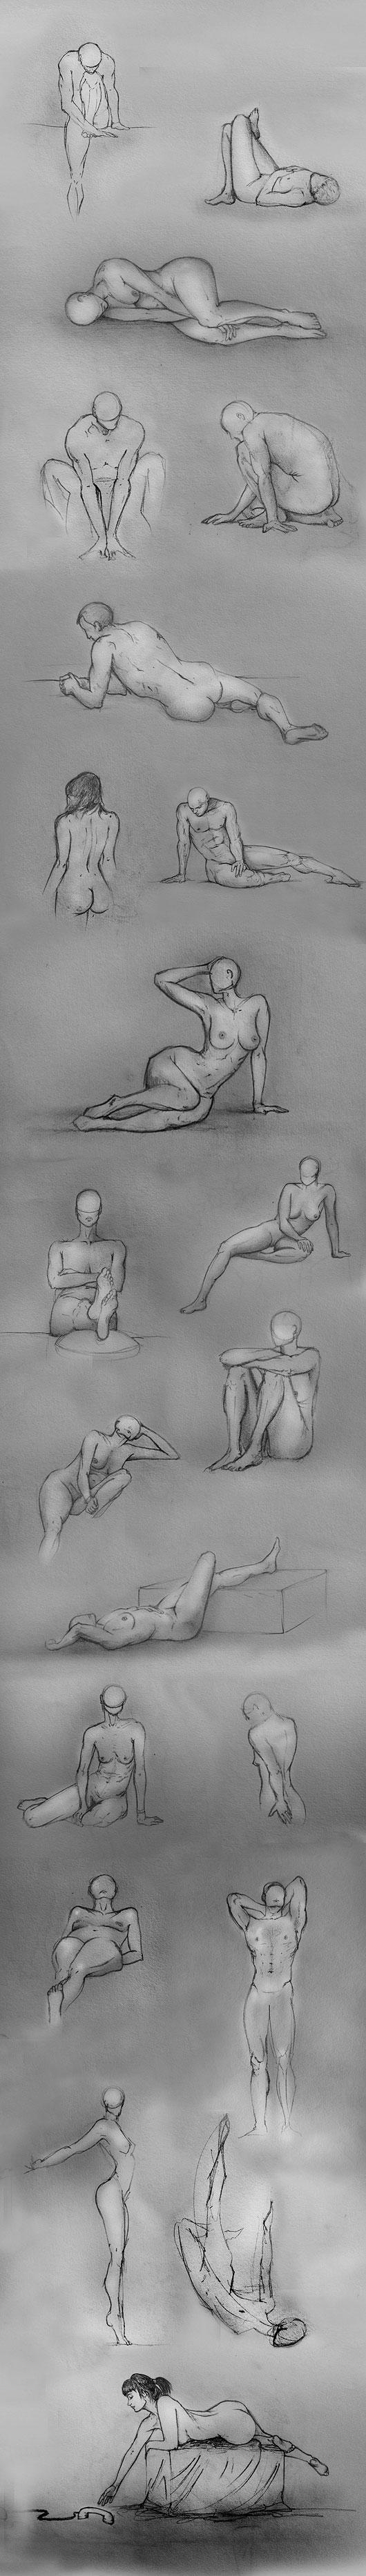 Pencil Illustrations